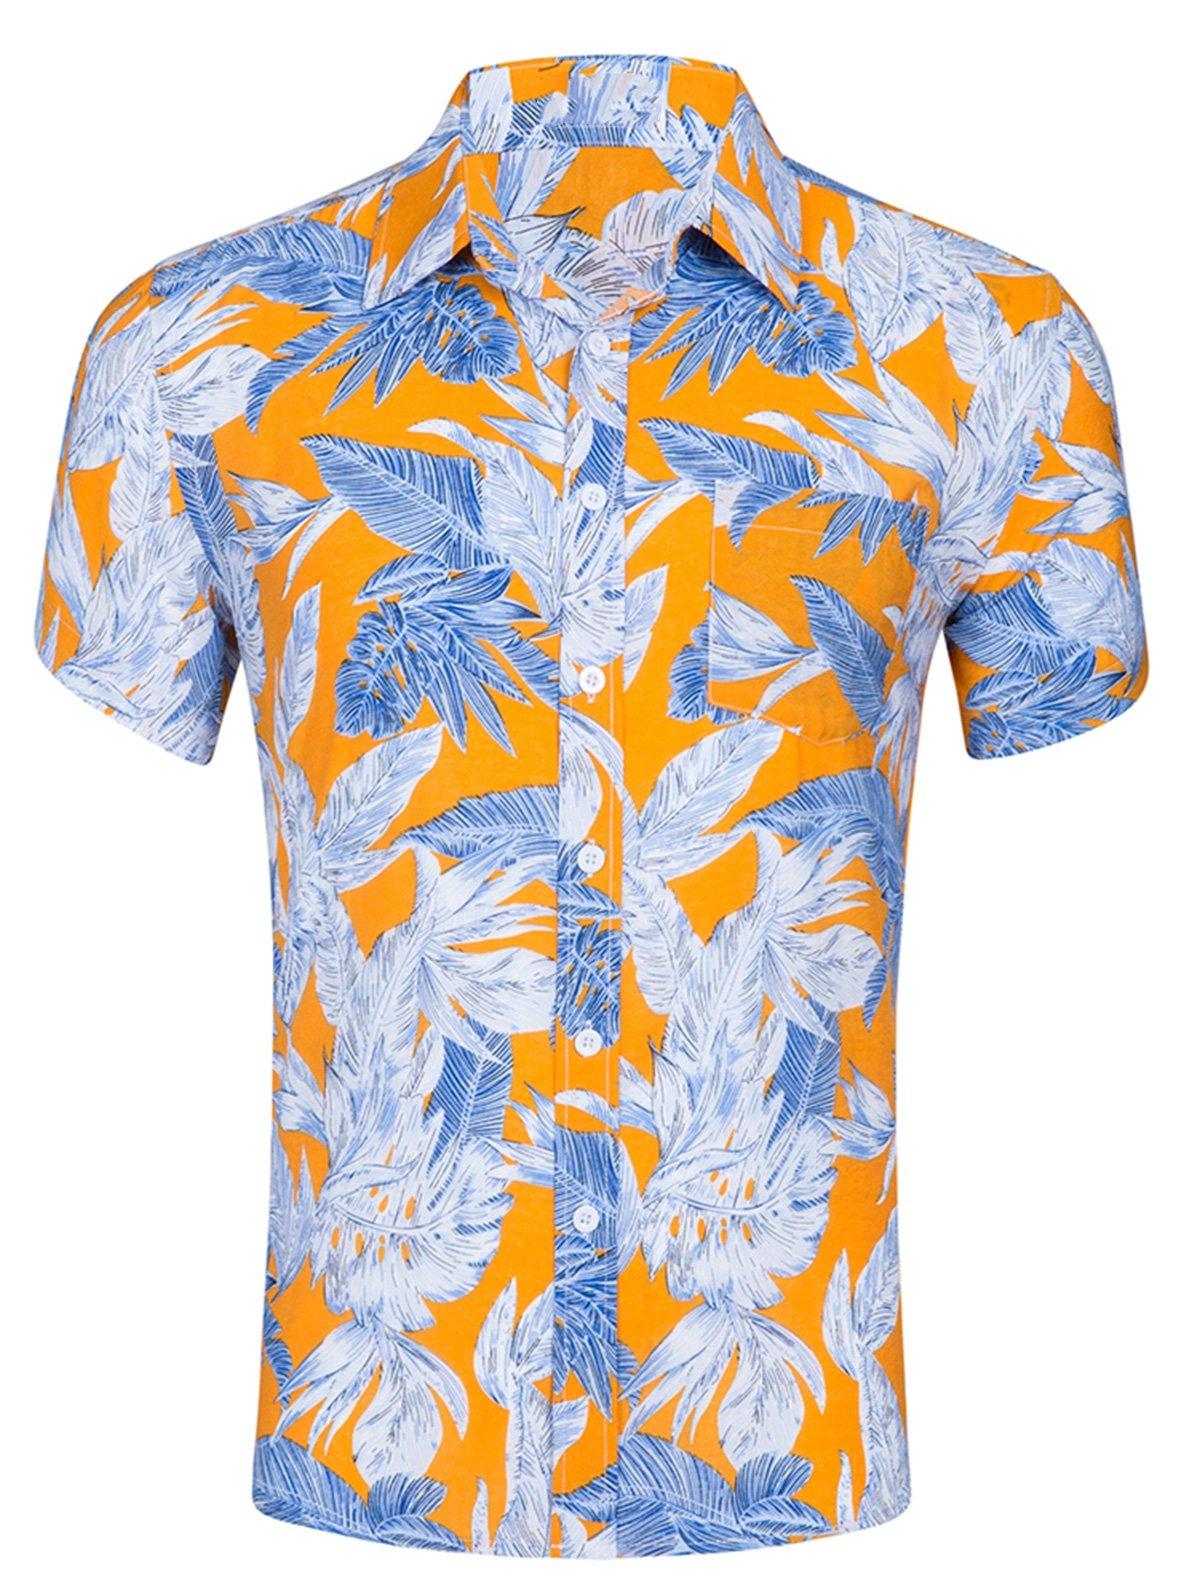 f52761d87d52 Where To Buy Hawaiian Shirt In Malaysia – EDGE Engineering and ...